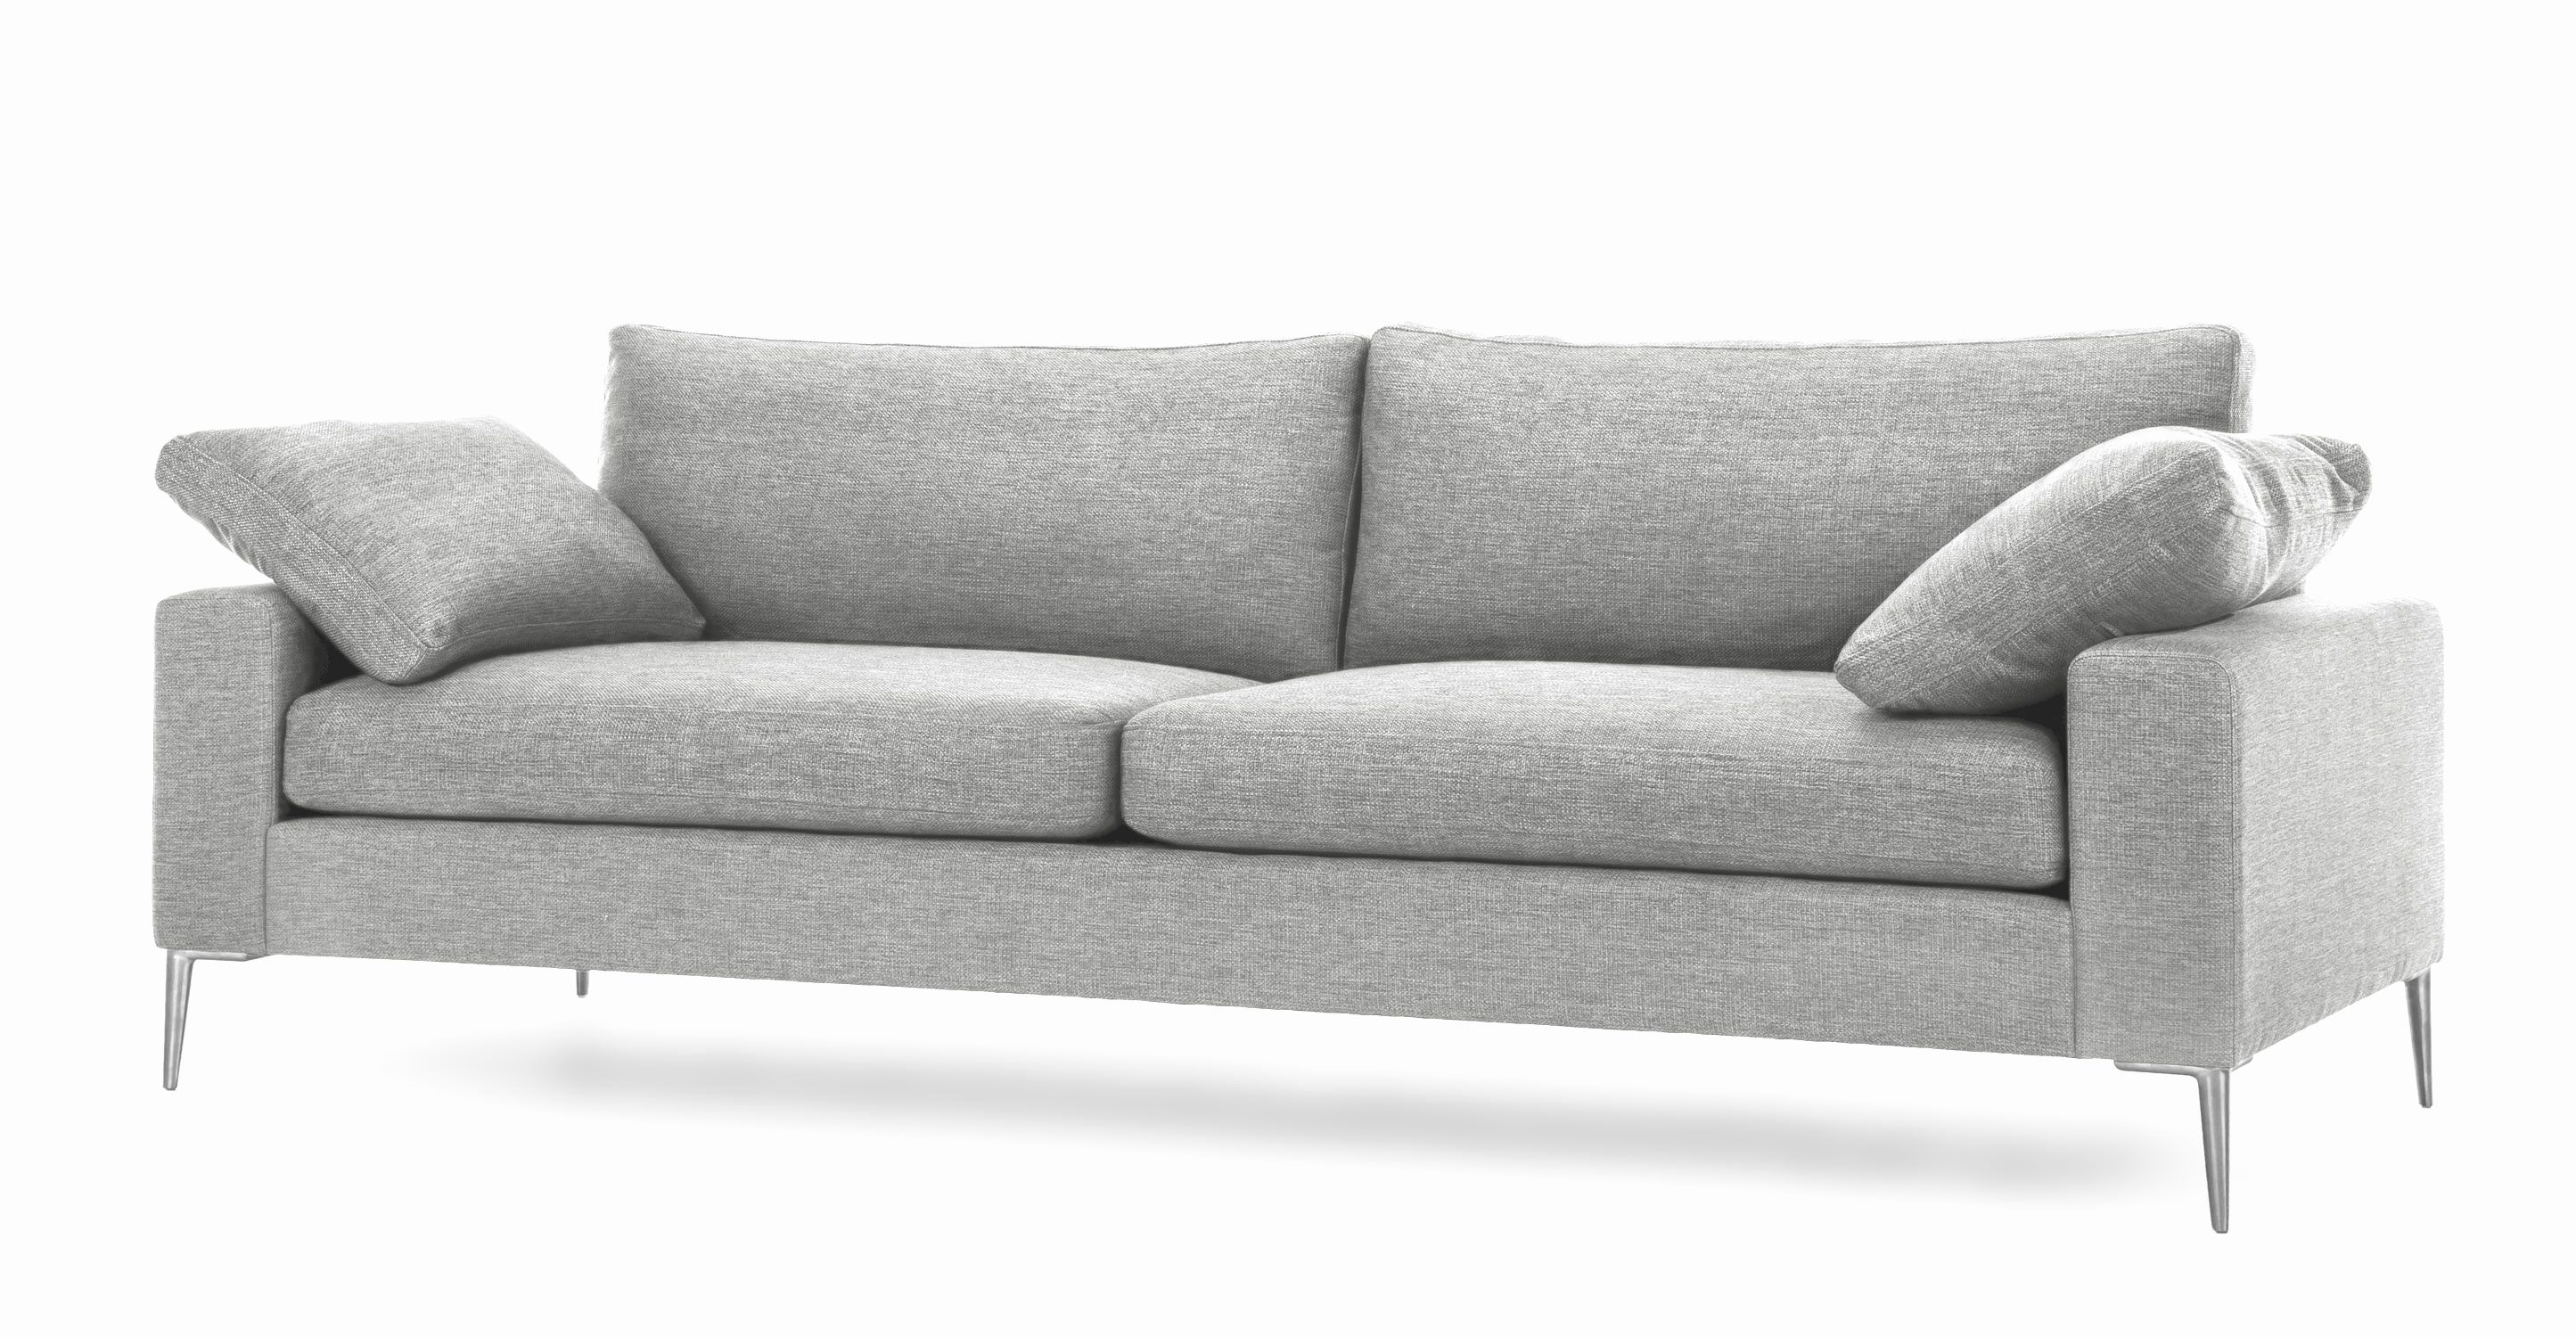 Inspirational Modern Gray Sofa Photographs Modern Gray Sofa Fresh